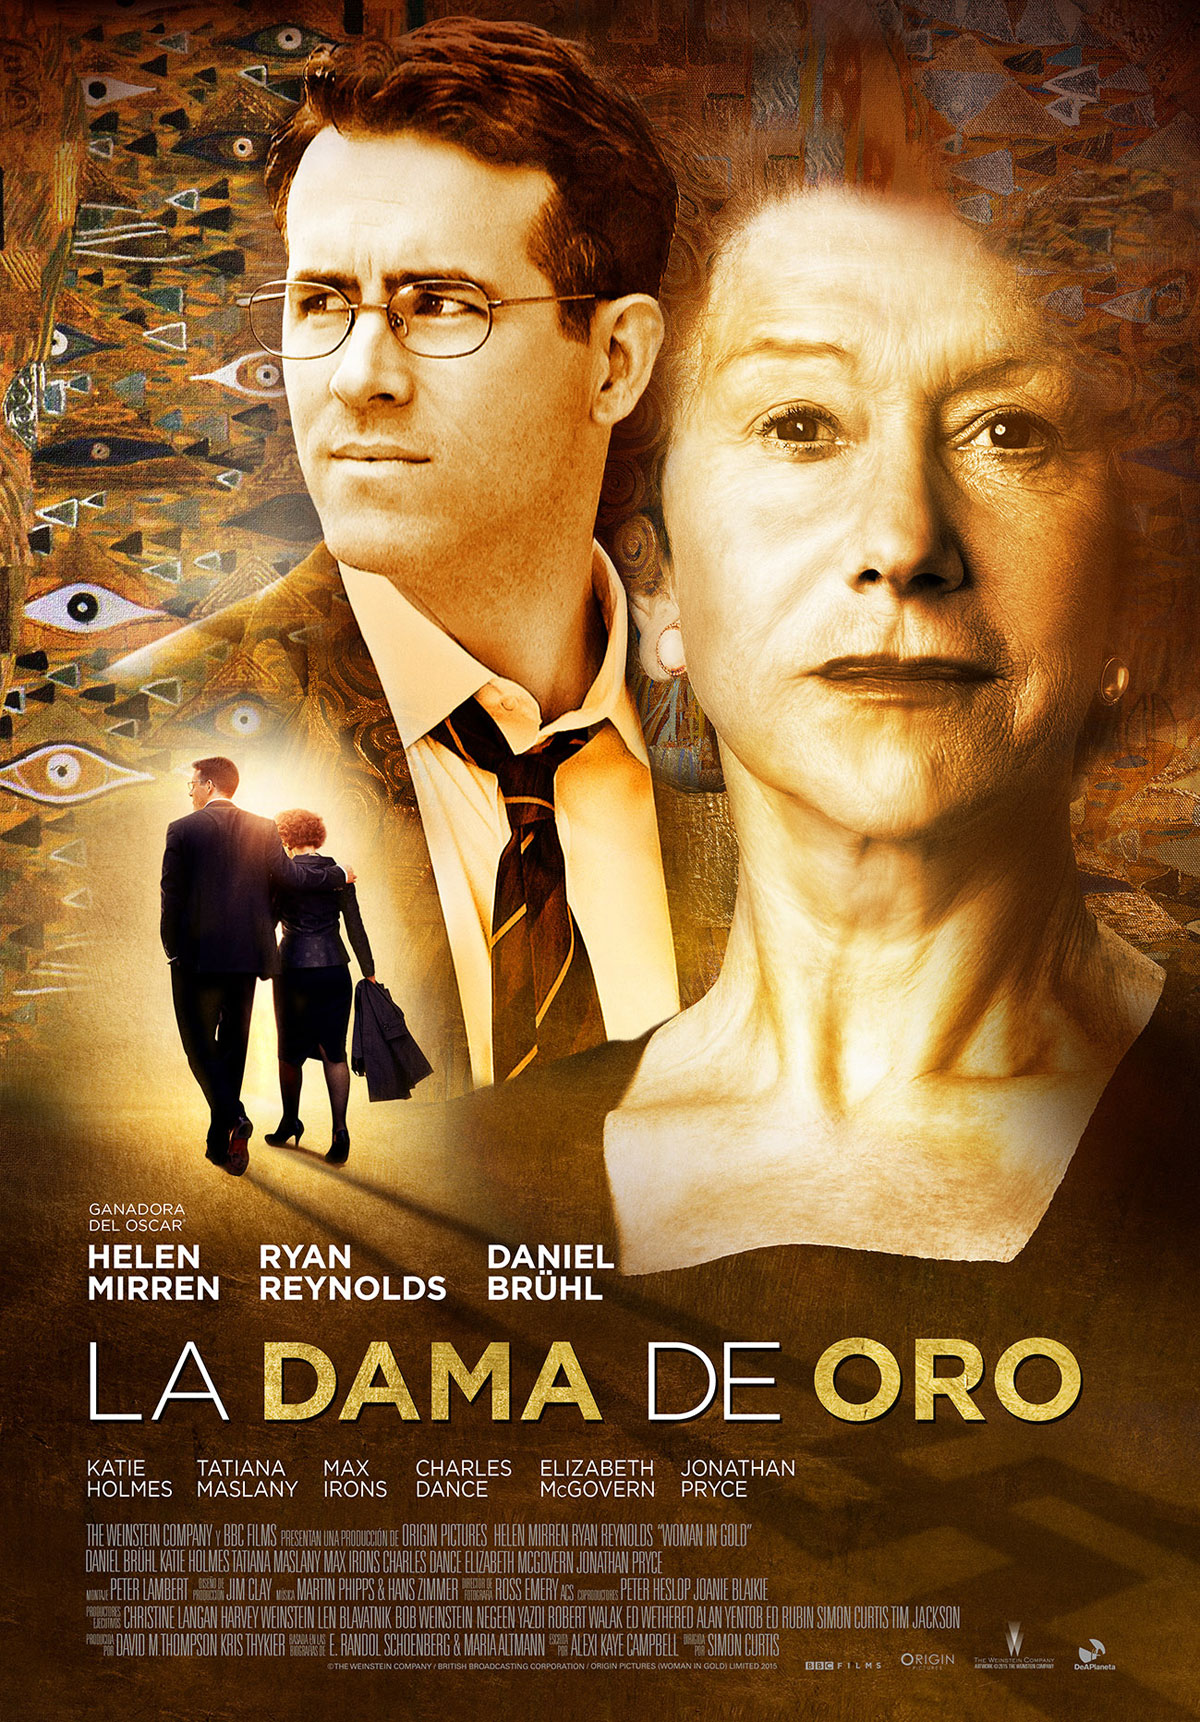 La dama de oro - Película 2015 - SensaCine.com